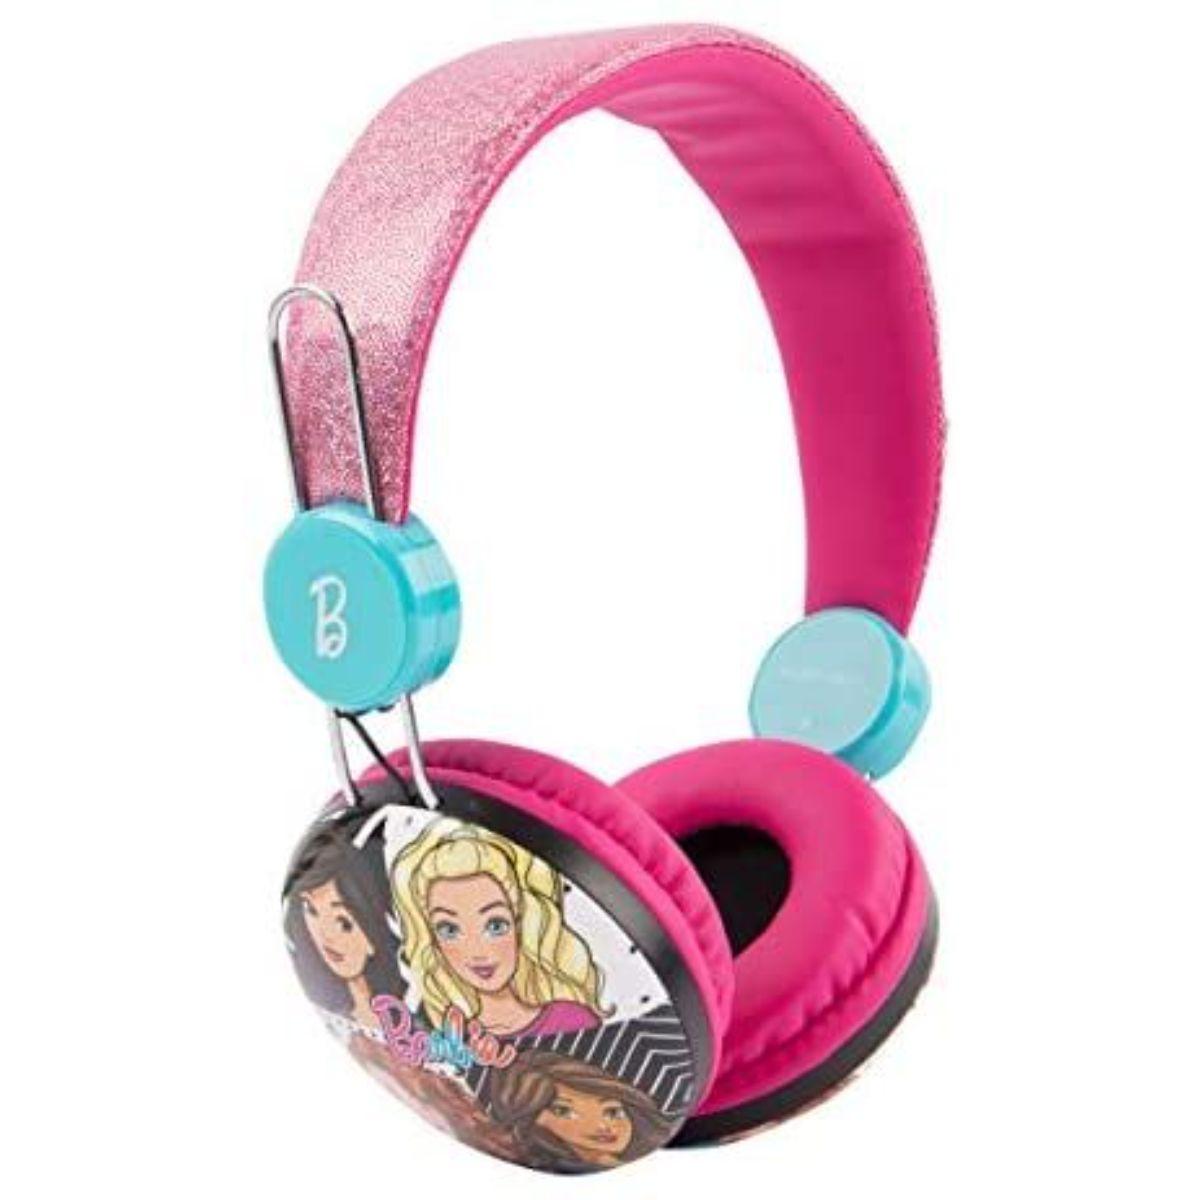 audifonos barbie 4 1 1